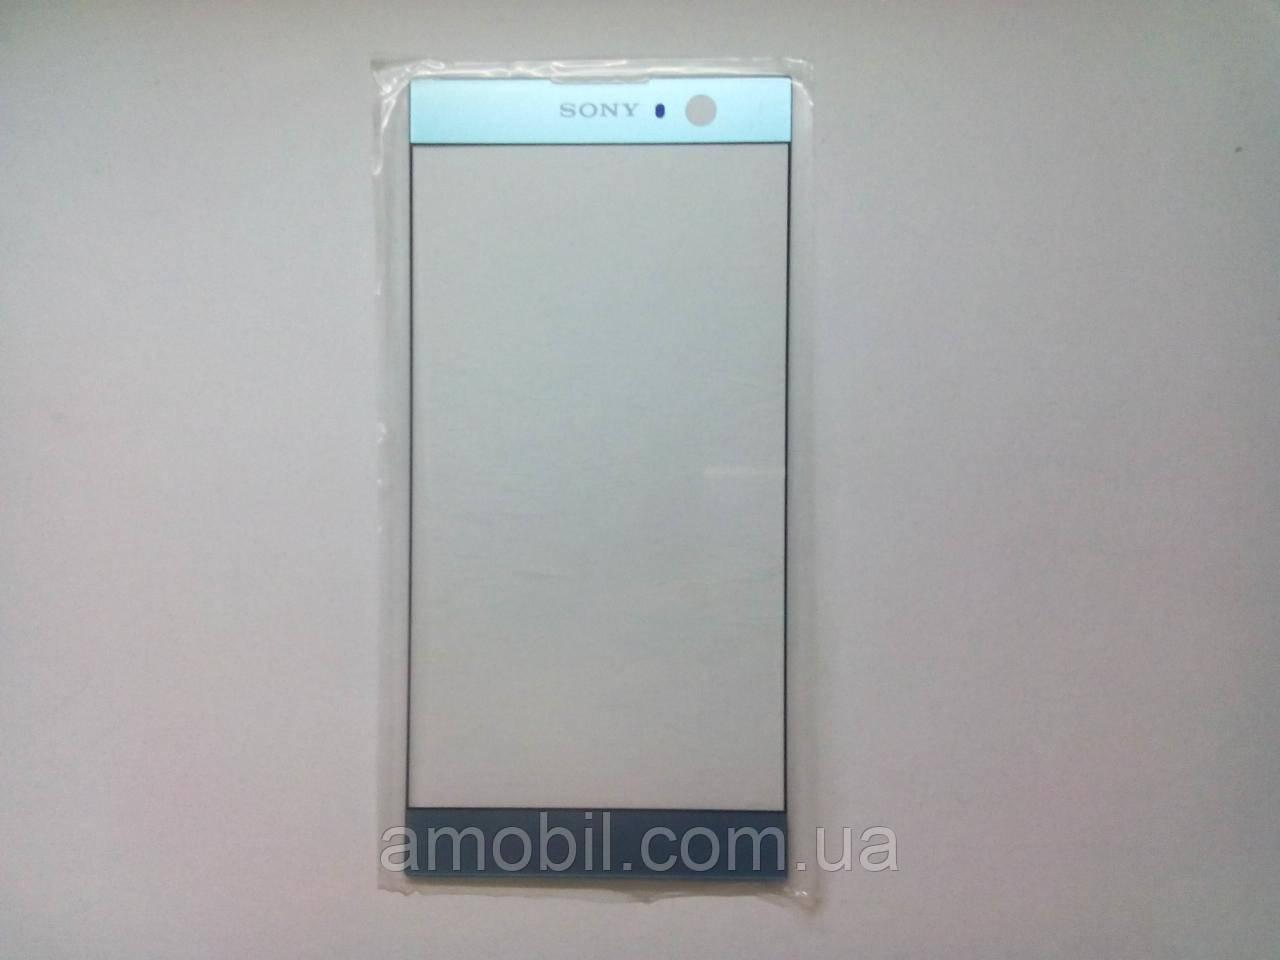 Стекло Sony Xperia XA2 H3113 / H3123 / H3133 / H4113 / H4133 blue